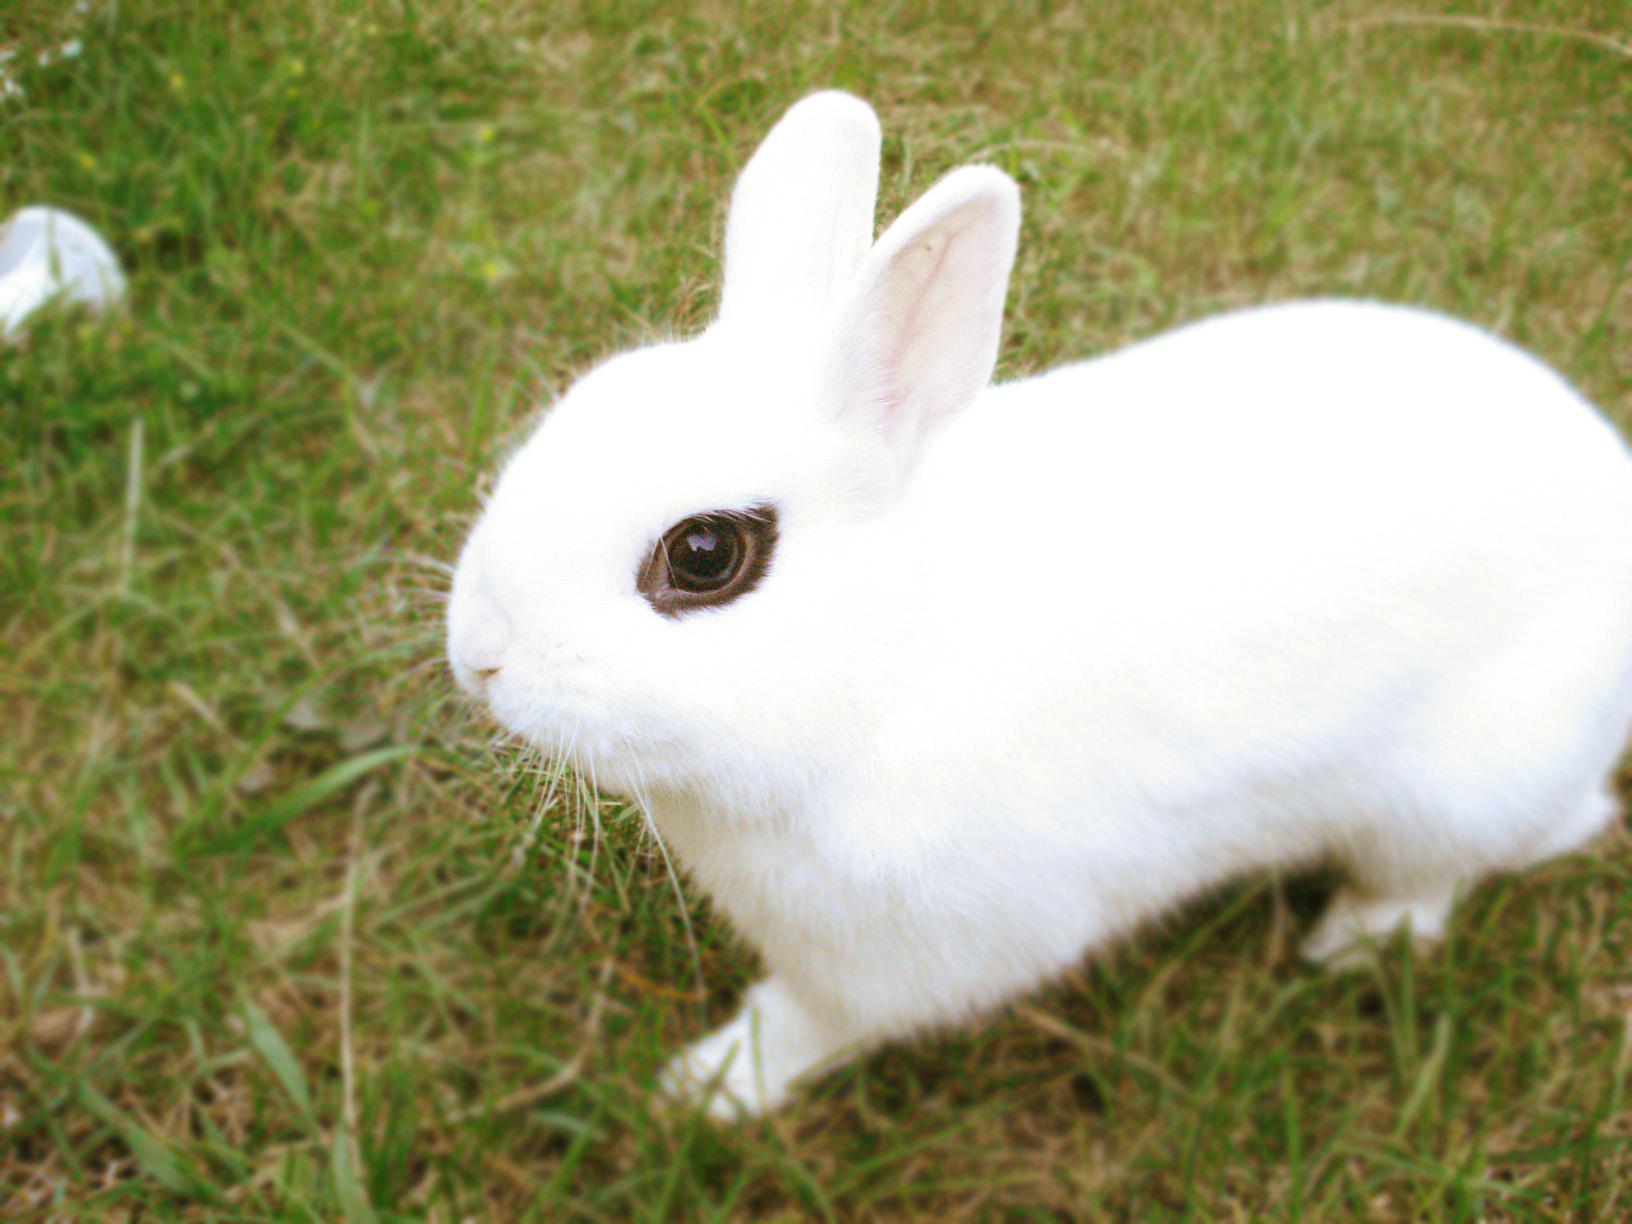 hotot bunnies on pinterest rabbit bunnies and dwarf bunnies